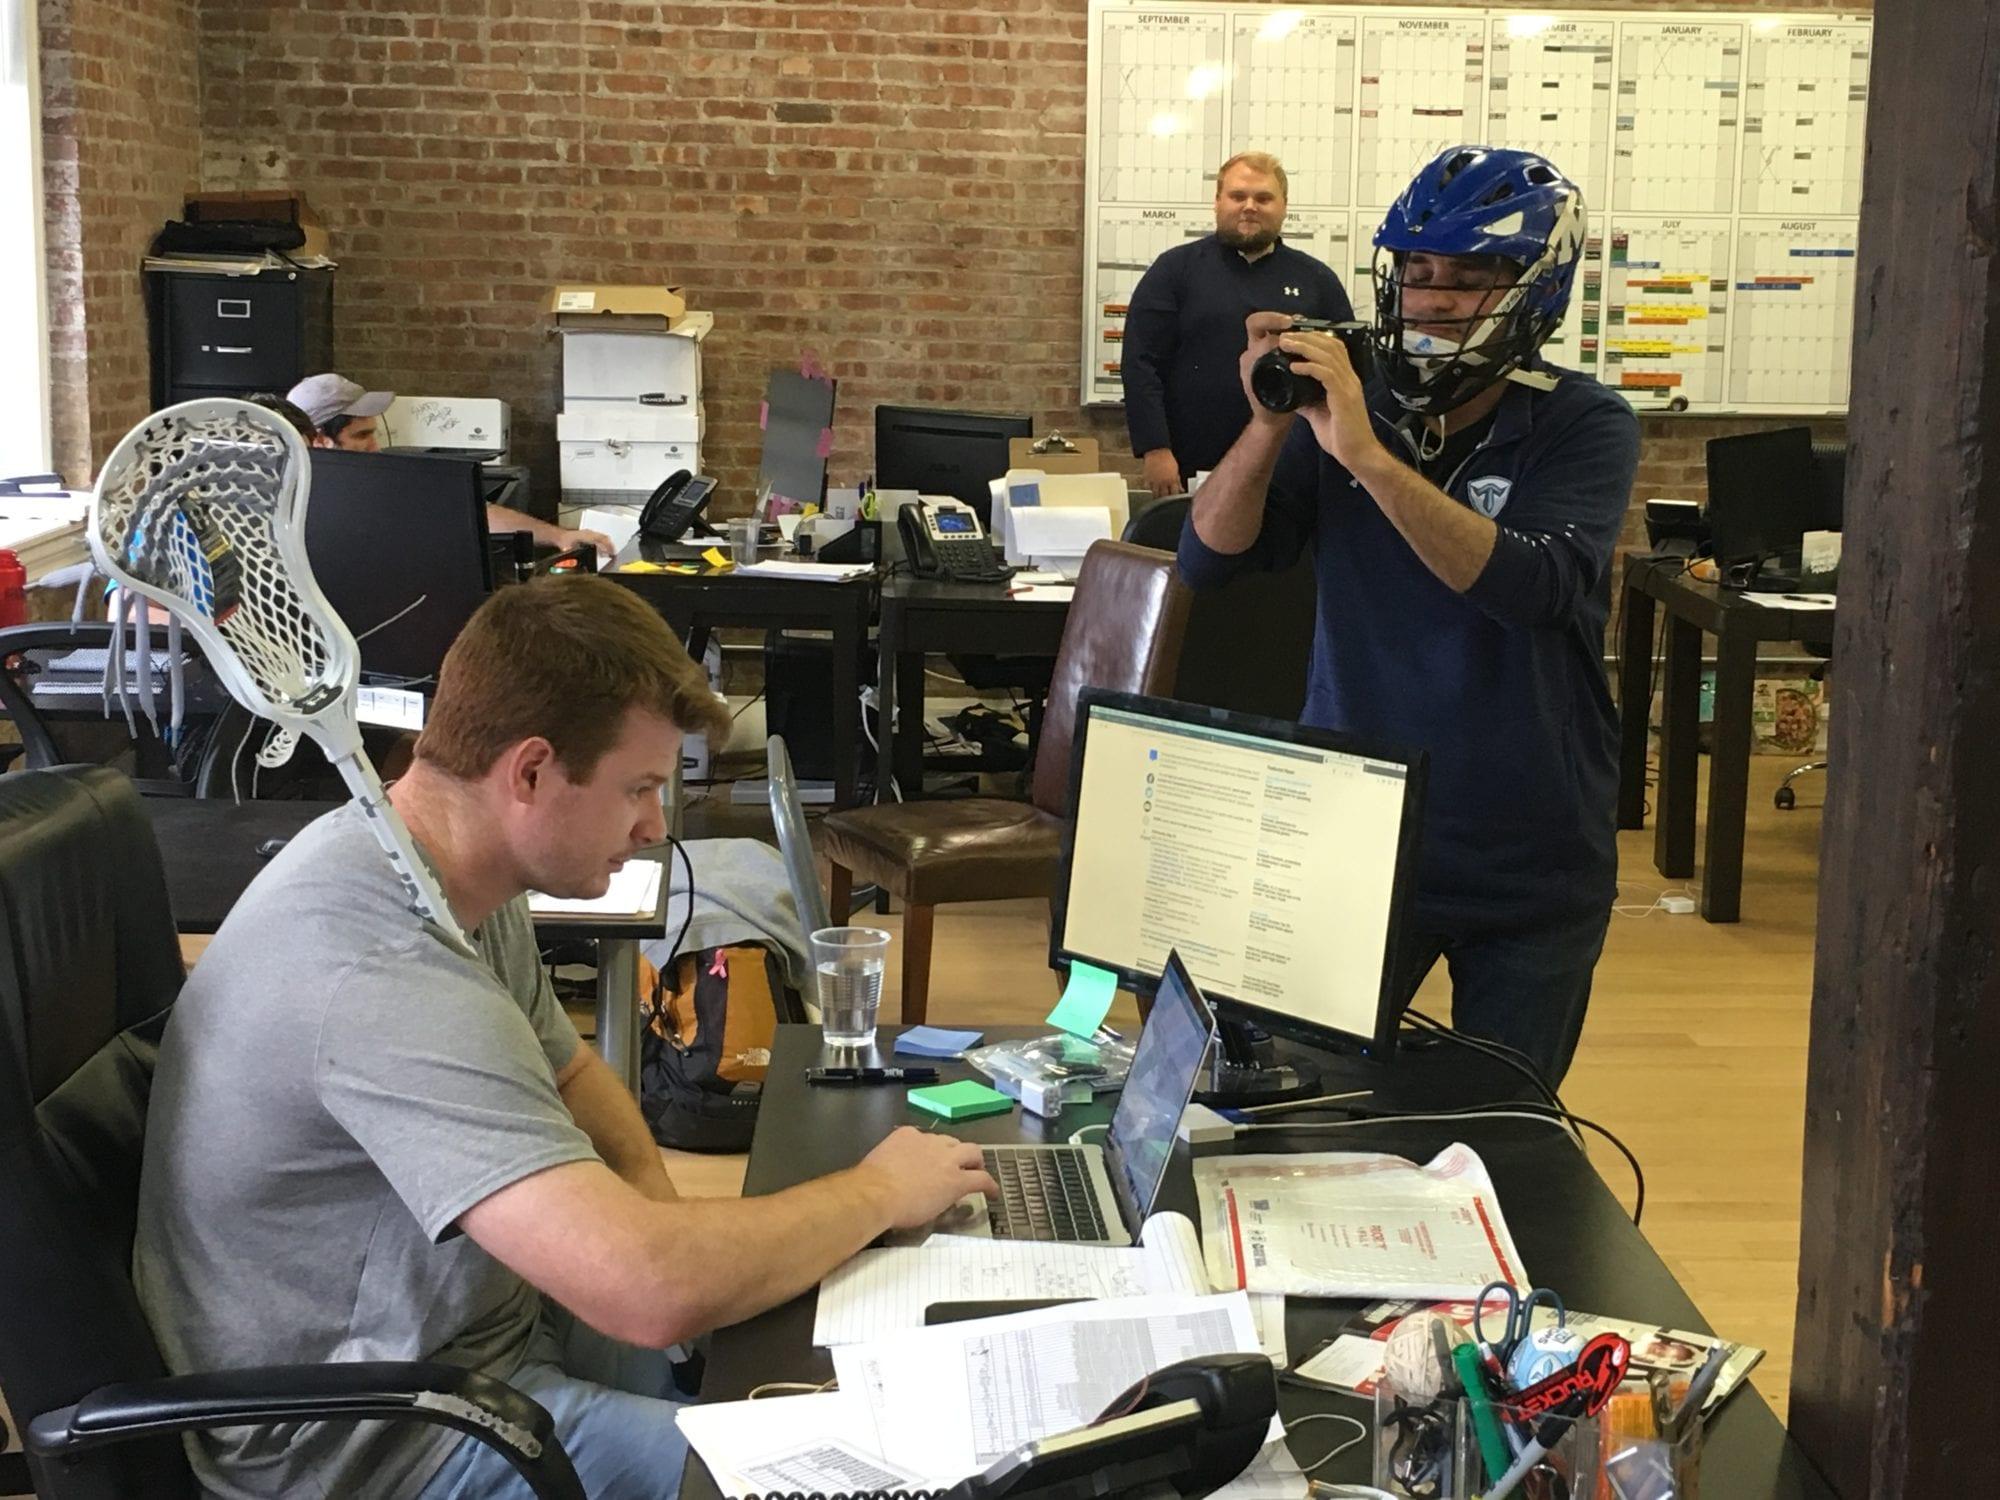 trilogy lacrosse digital content creator lacrosse journey